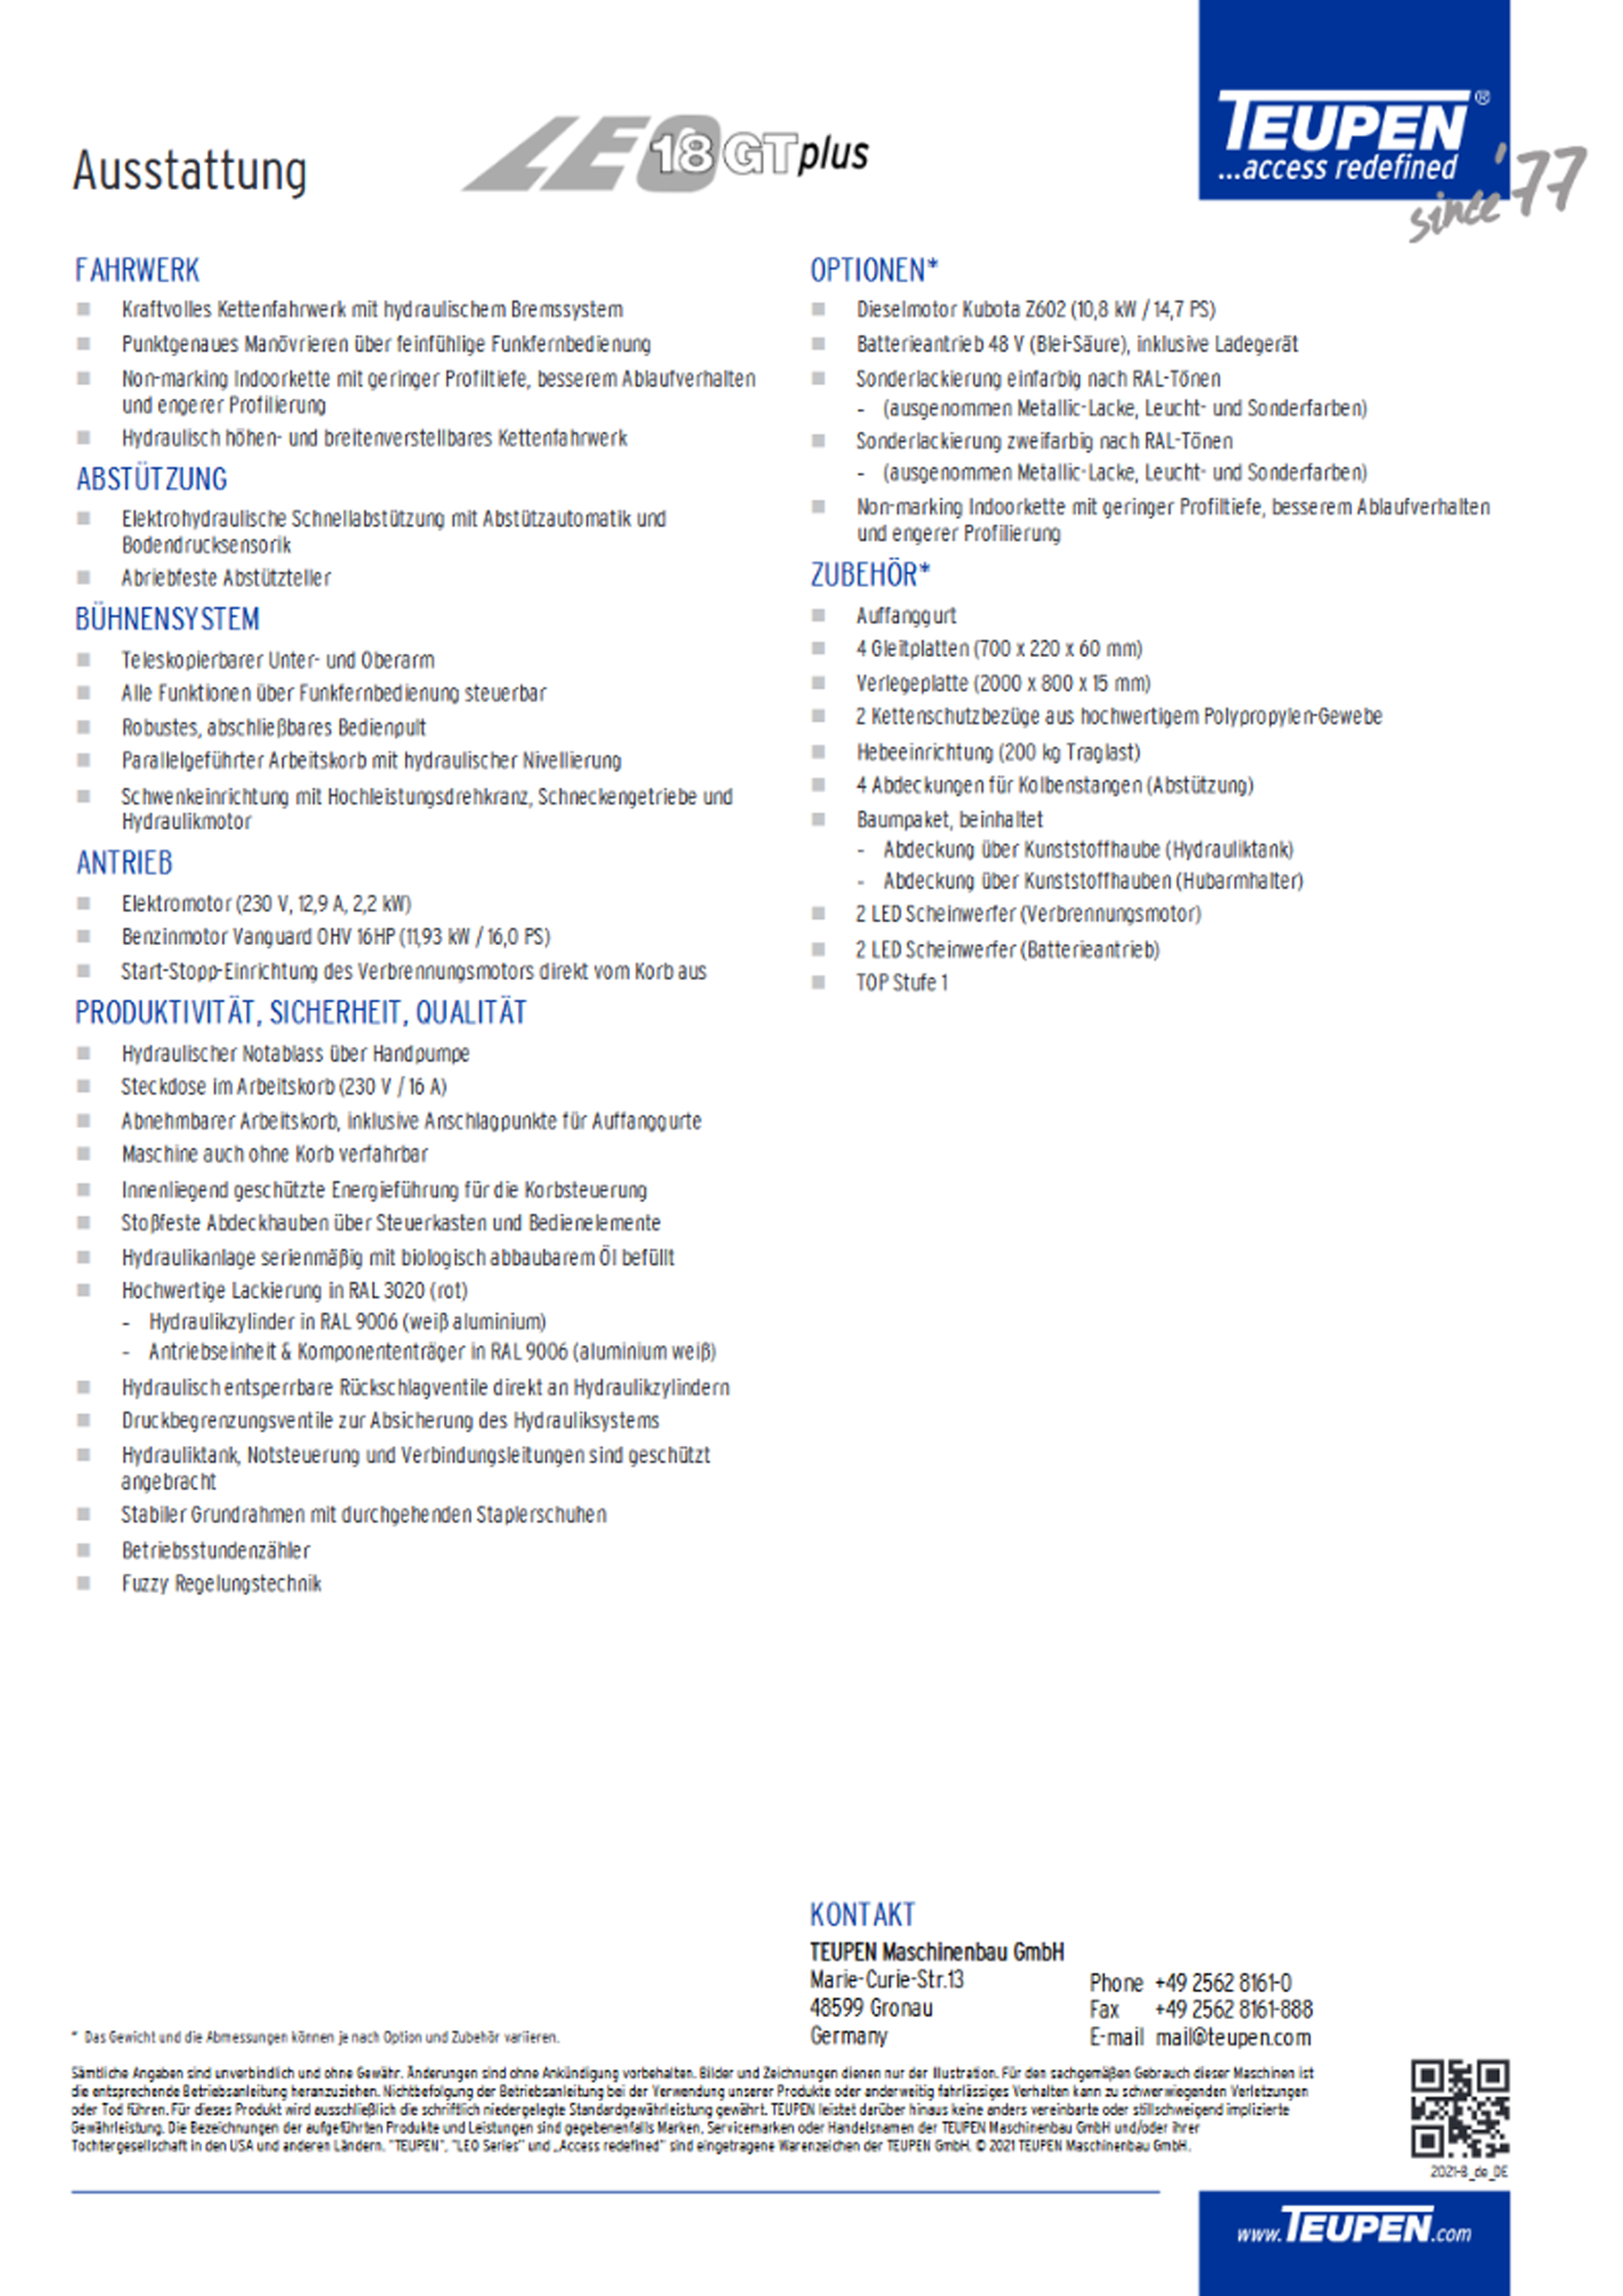 LEO18GTplus Datenblatt 2